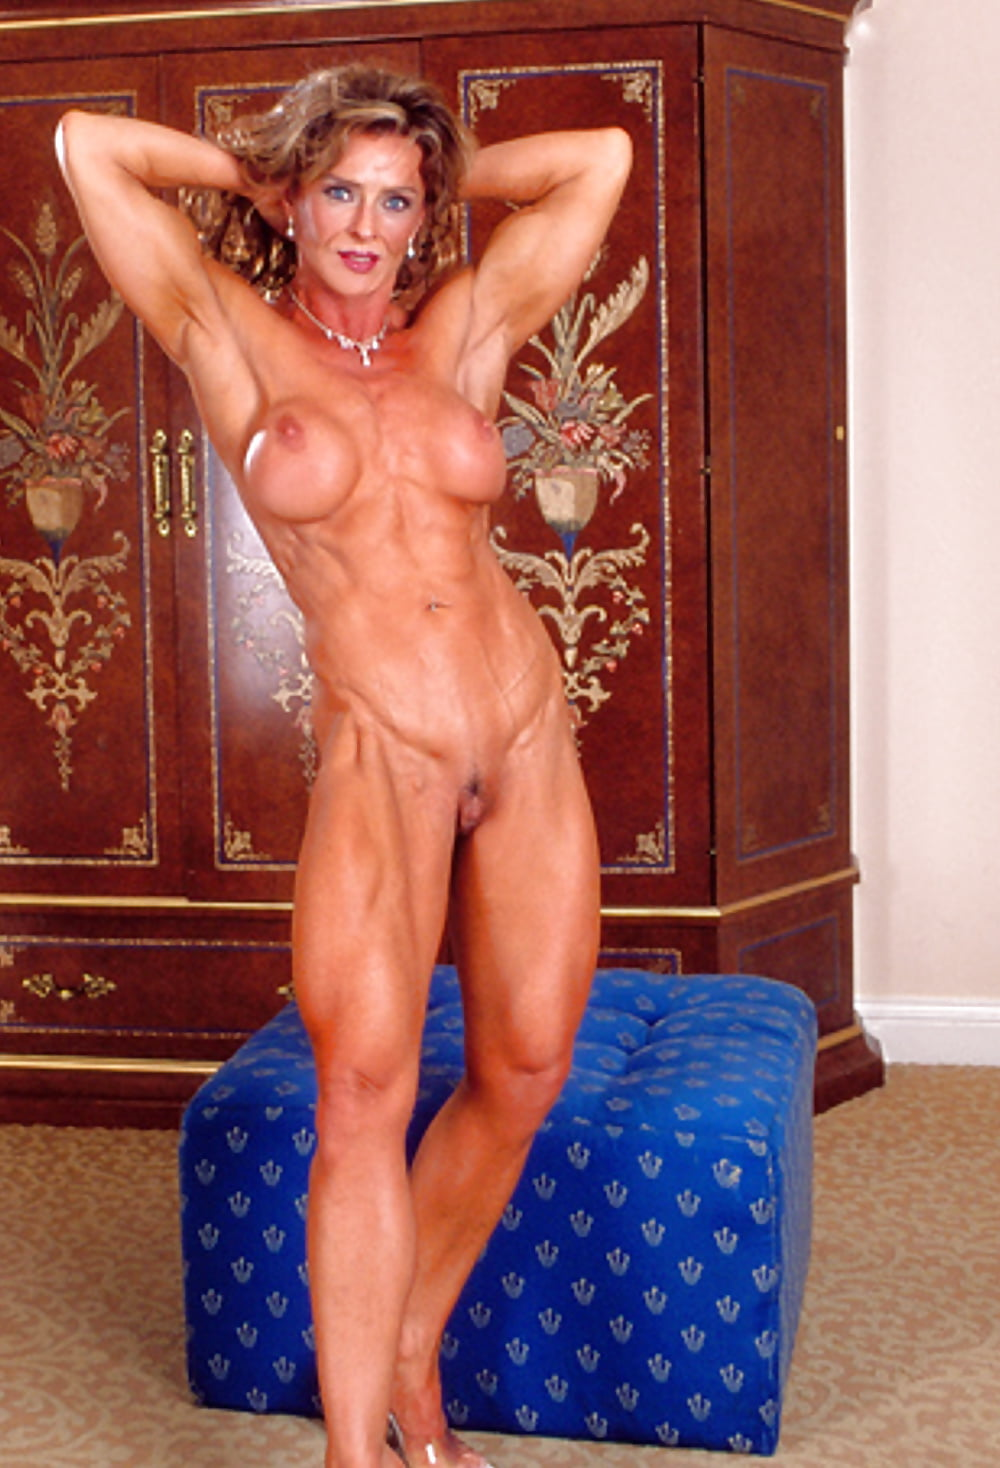 mature-muscle-women-sex-petite-paris-hotel